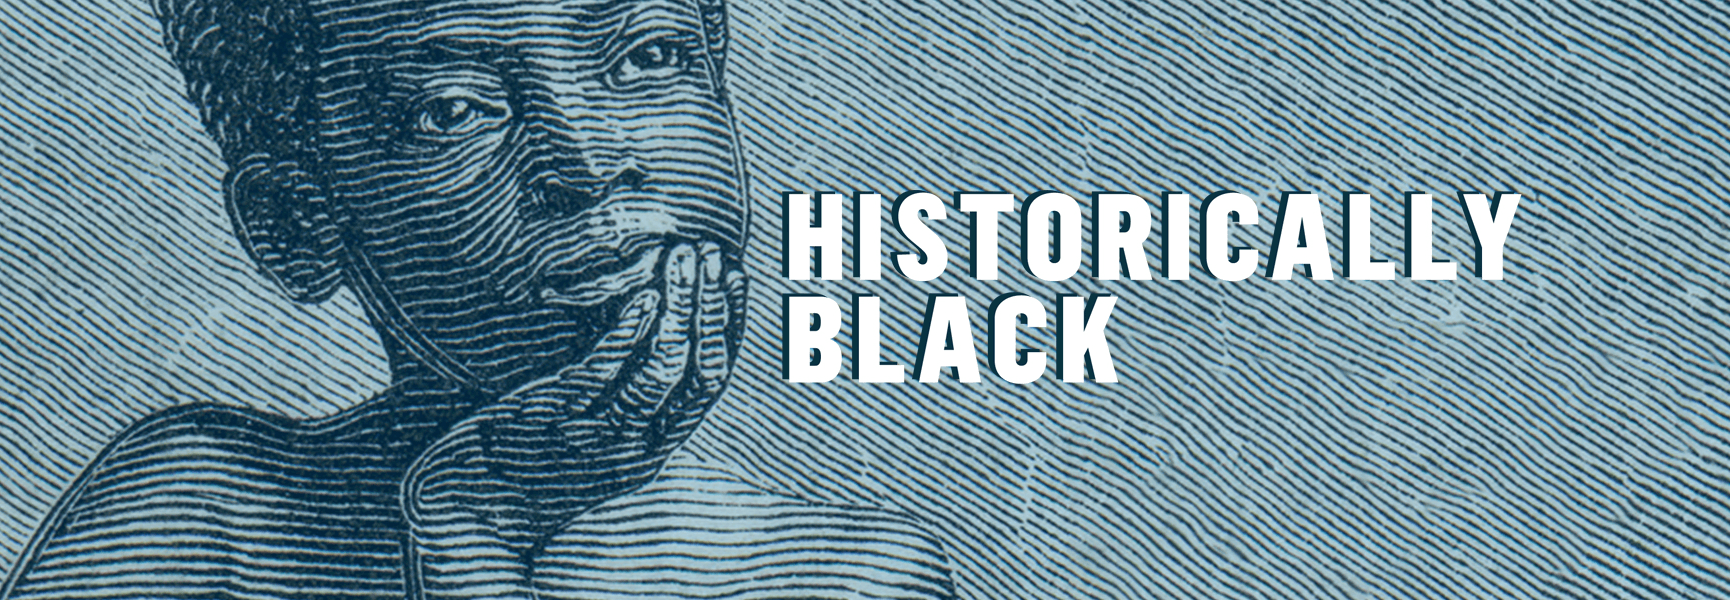 Historically Black young black boy thinking podcast logo